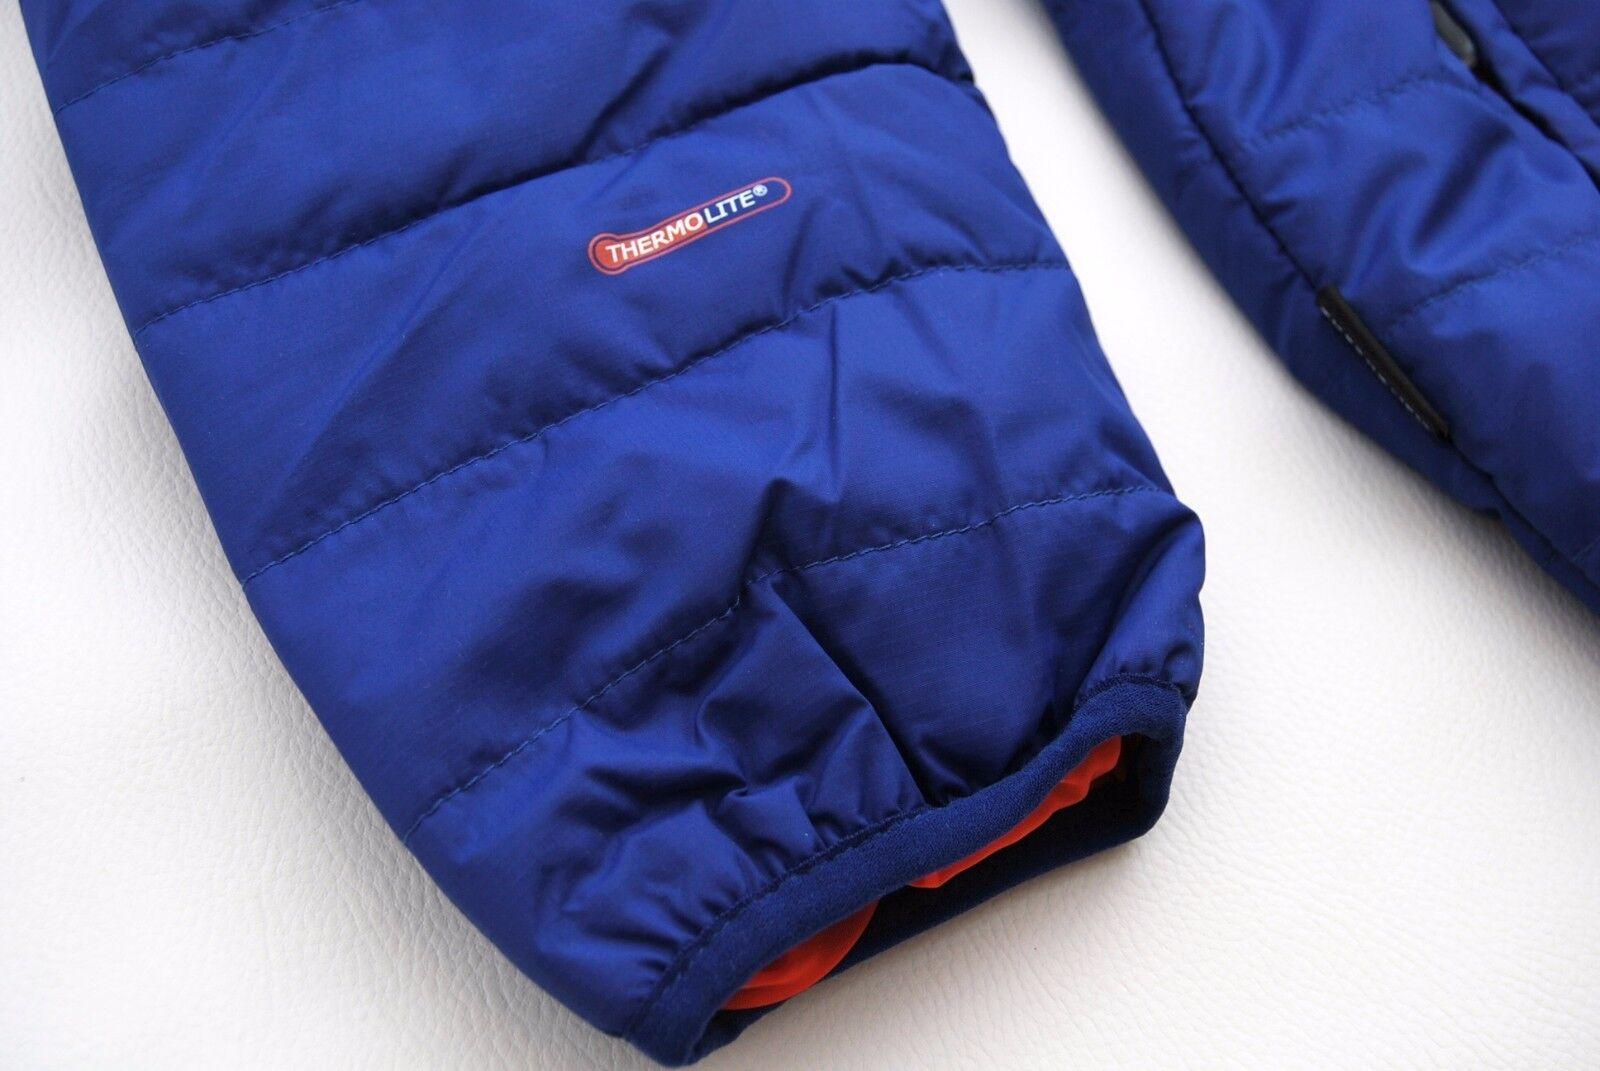 Outdoorjacke Outdoorjacke Outdoorjacke Thermojacke Steppjacke Unterjacke Sportjacke ThermoLite Micro 1068e4